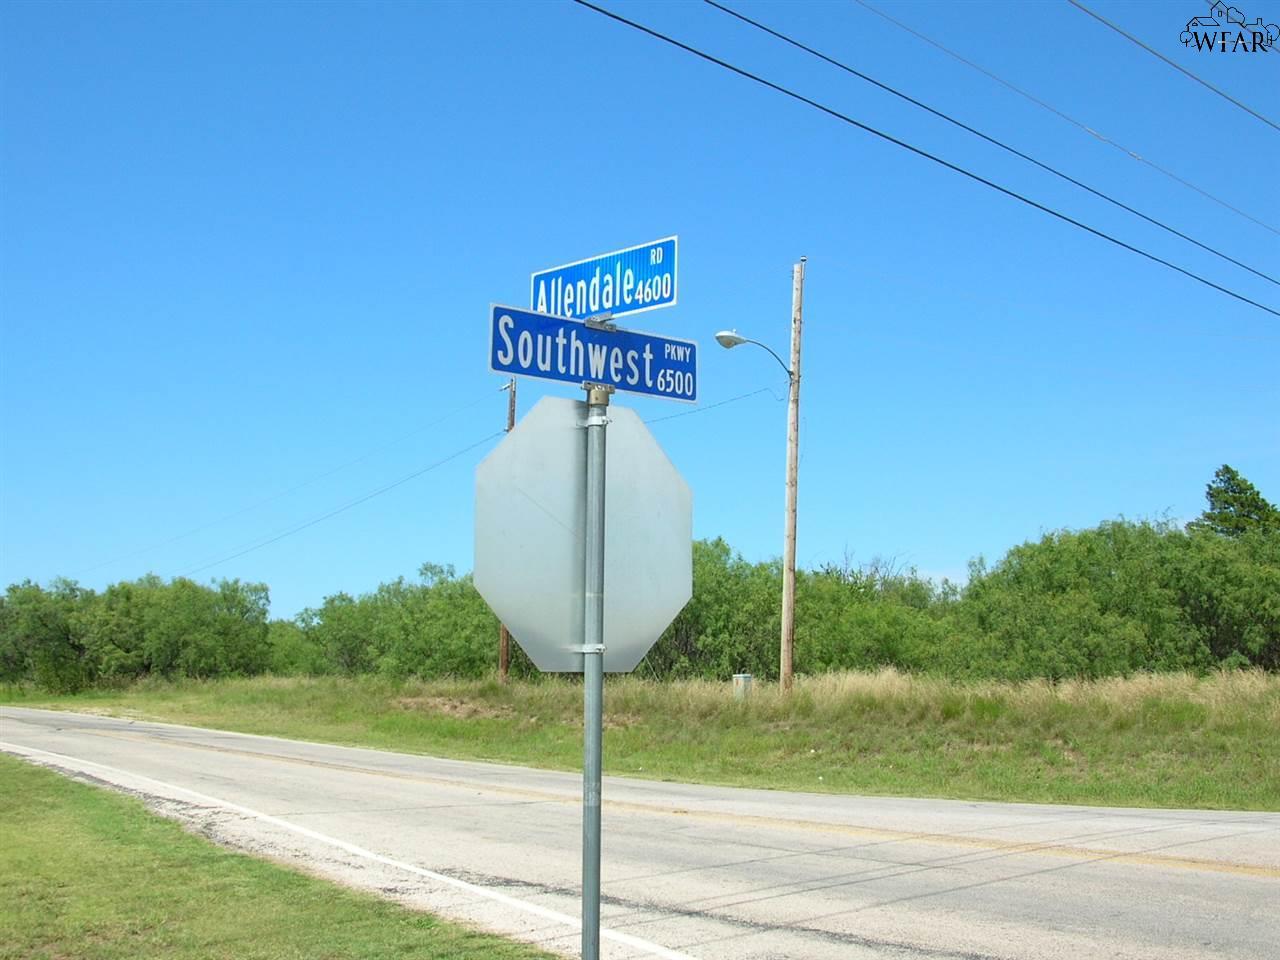 4559 ALLENDALE ROAD 6320 Southwest Parkway, Wichita Falls, TX 76310